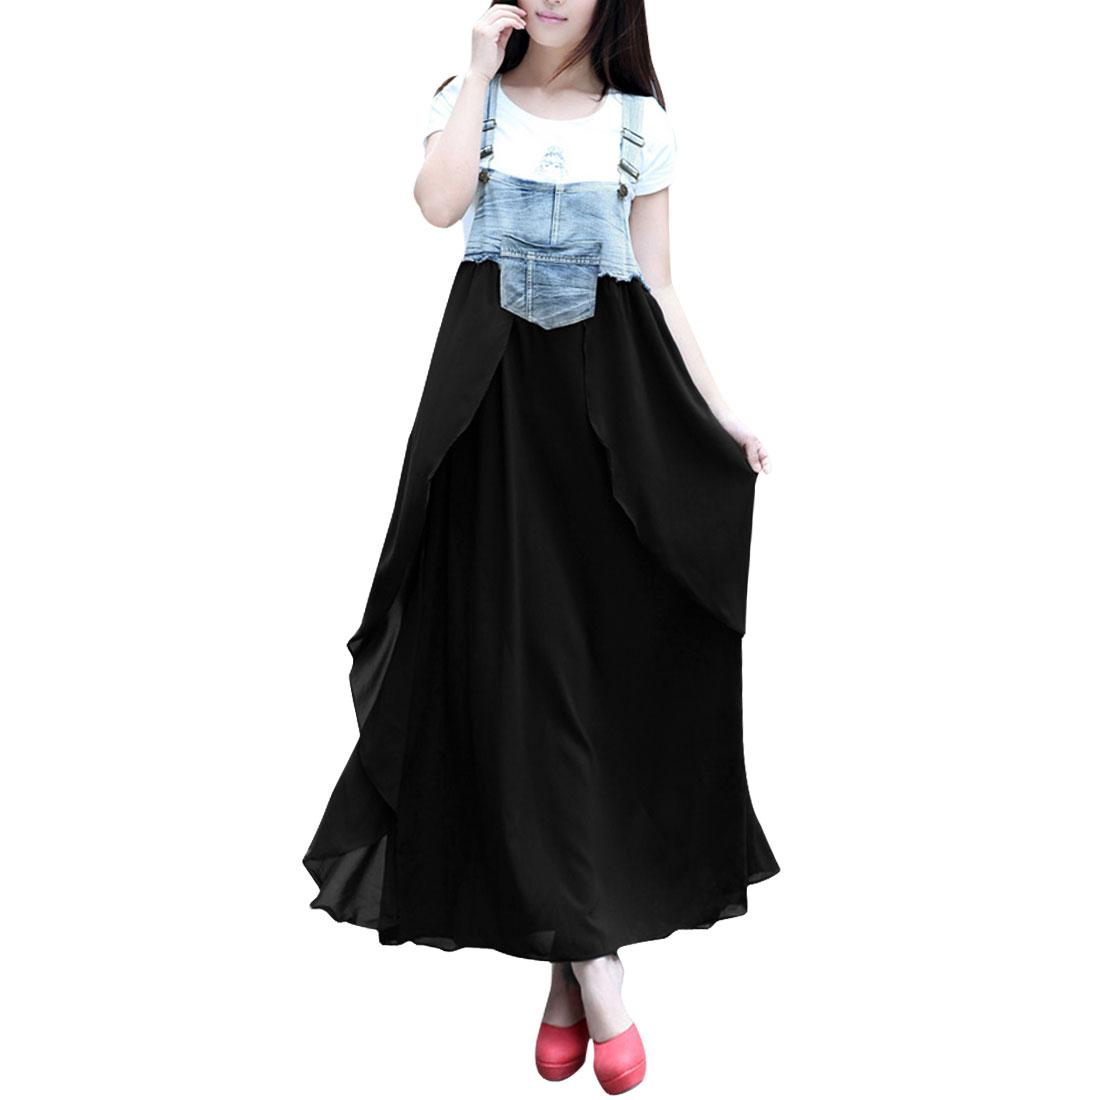 Ladies Sleeveless Above Knee Panel Chiffon Suspender Dress Black Light Blue XS